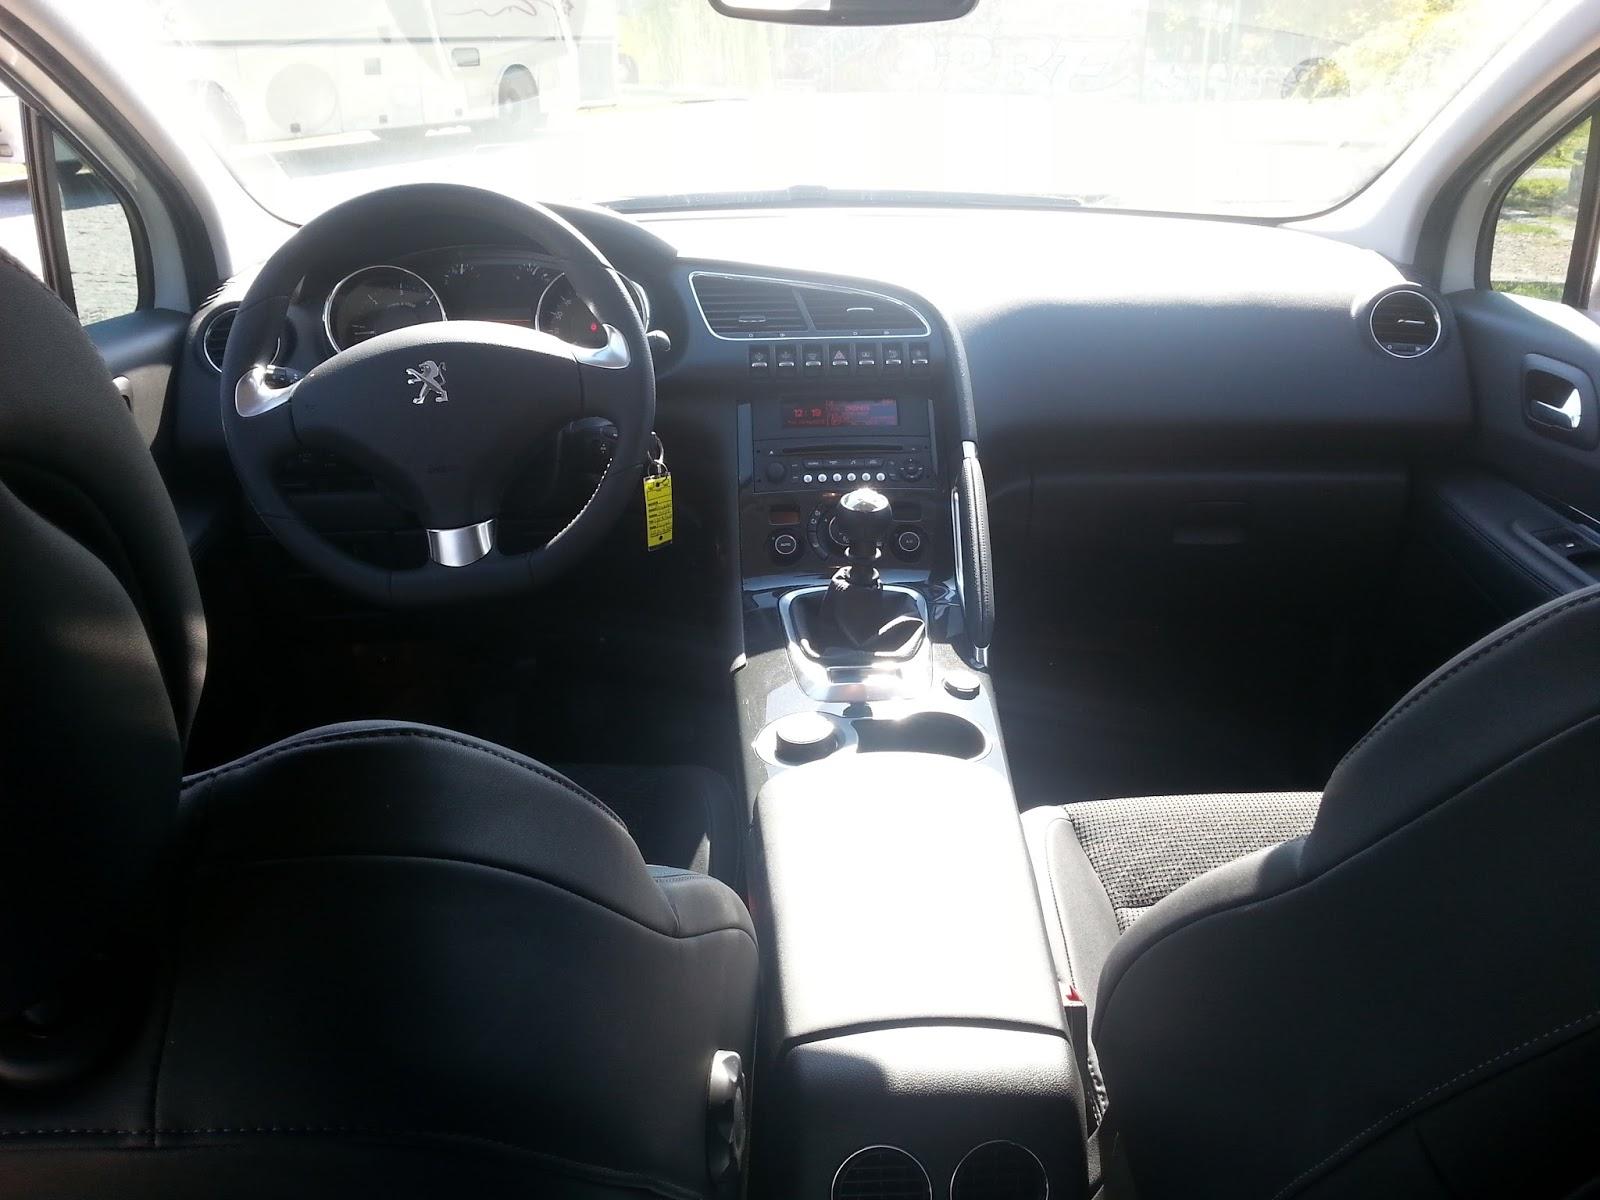 interior Γιατί το Peugeot 3008 είναι σαν τον σούπερμαν